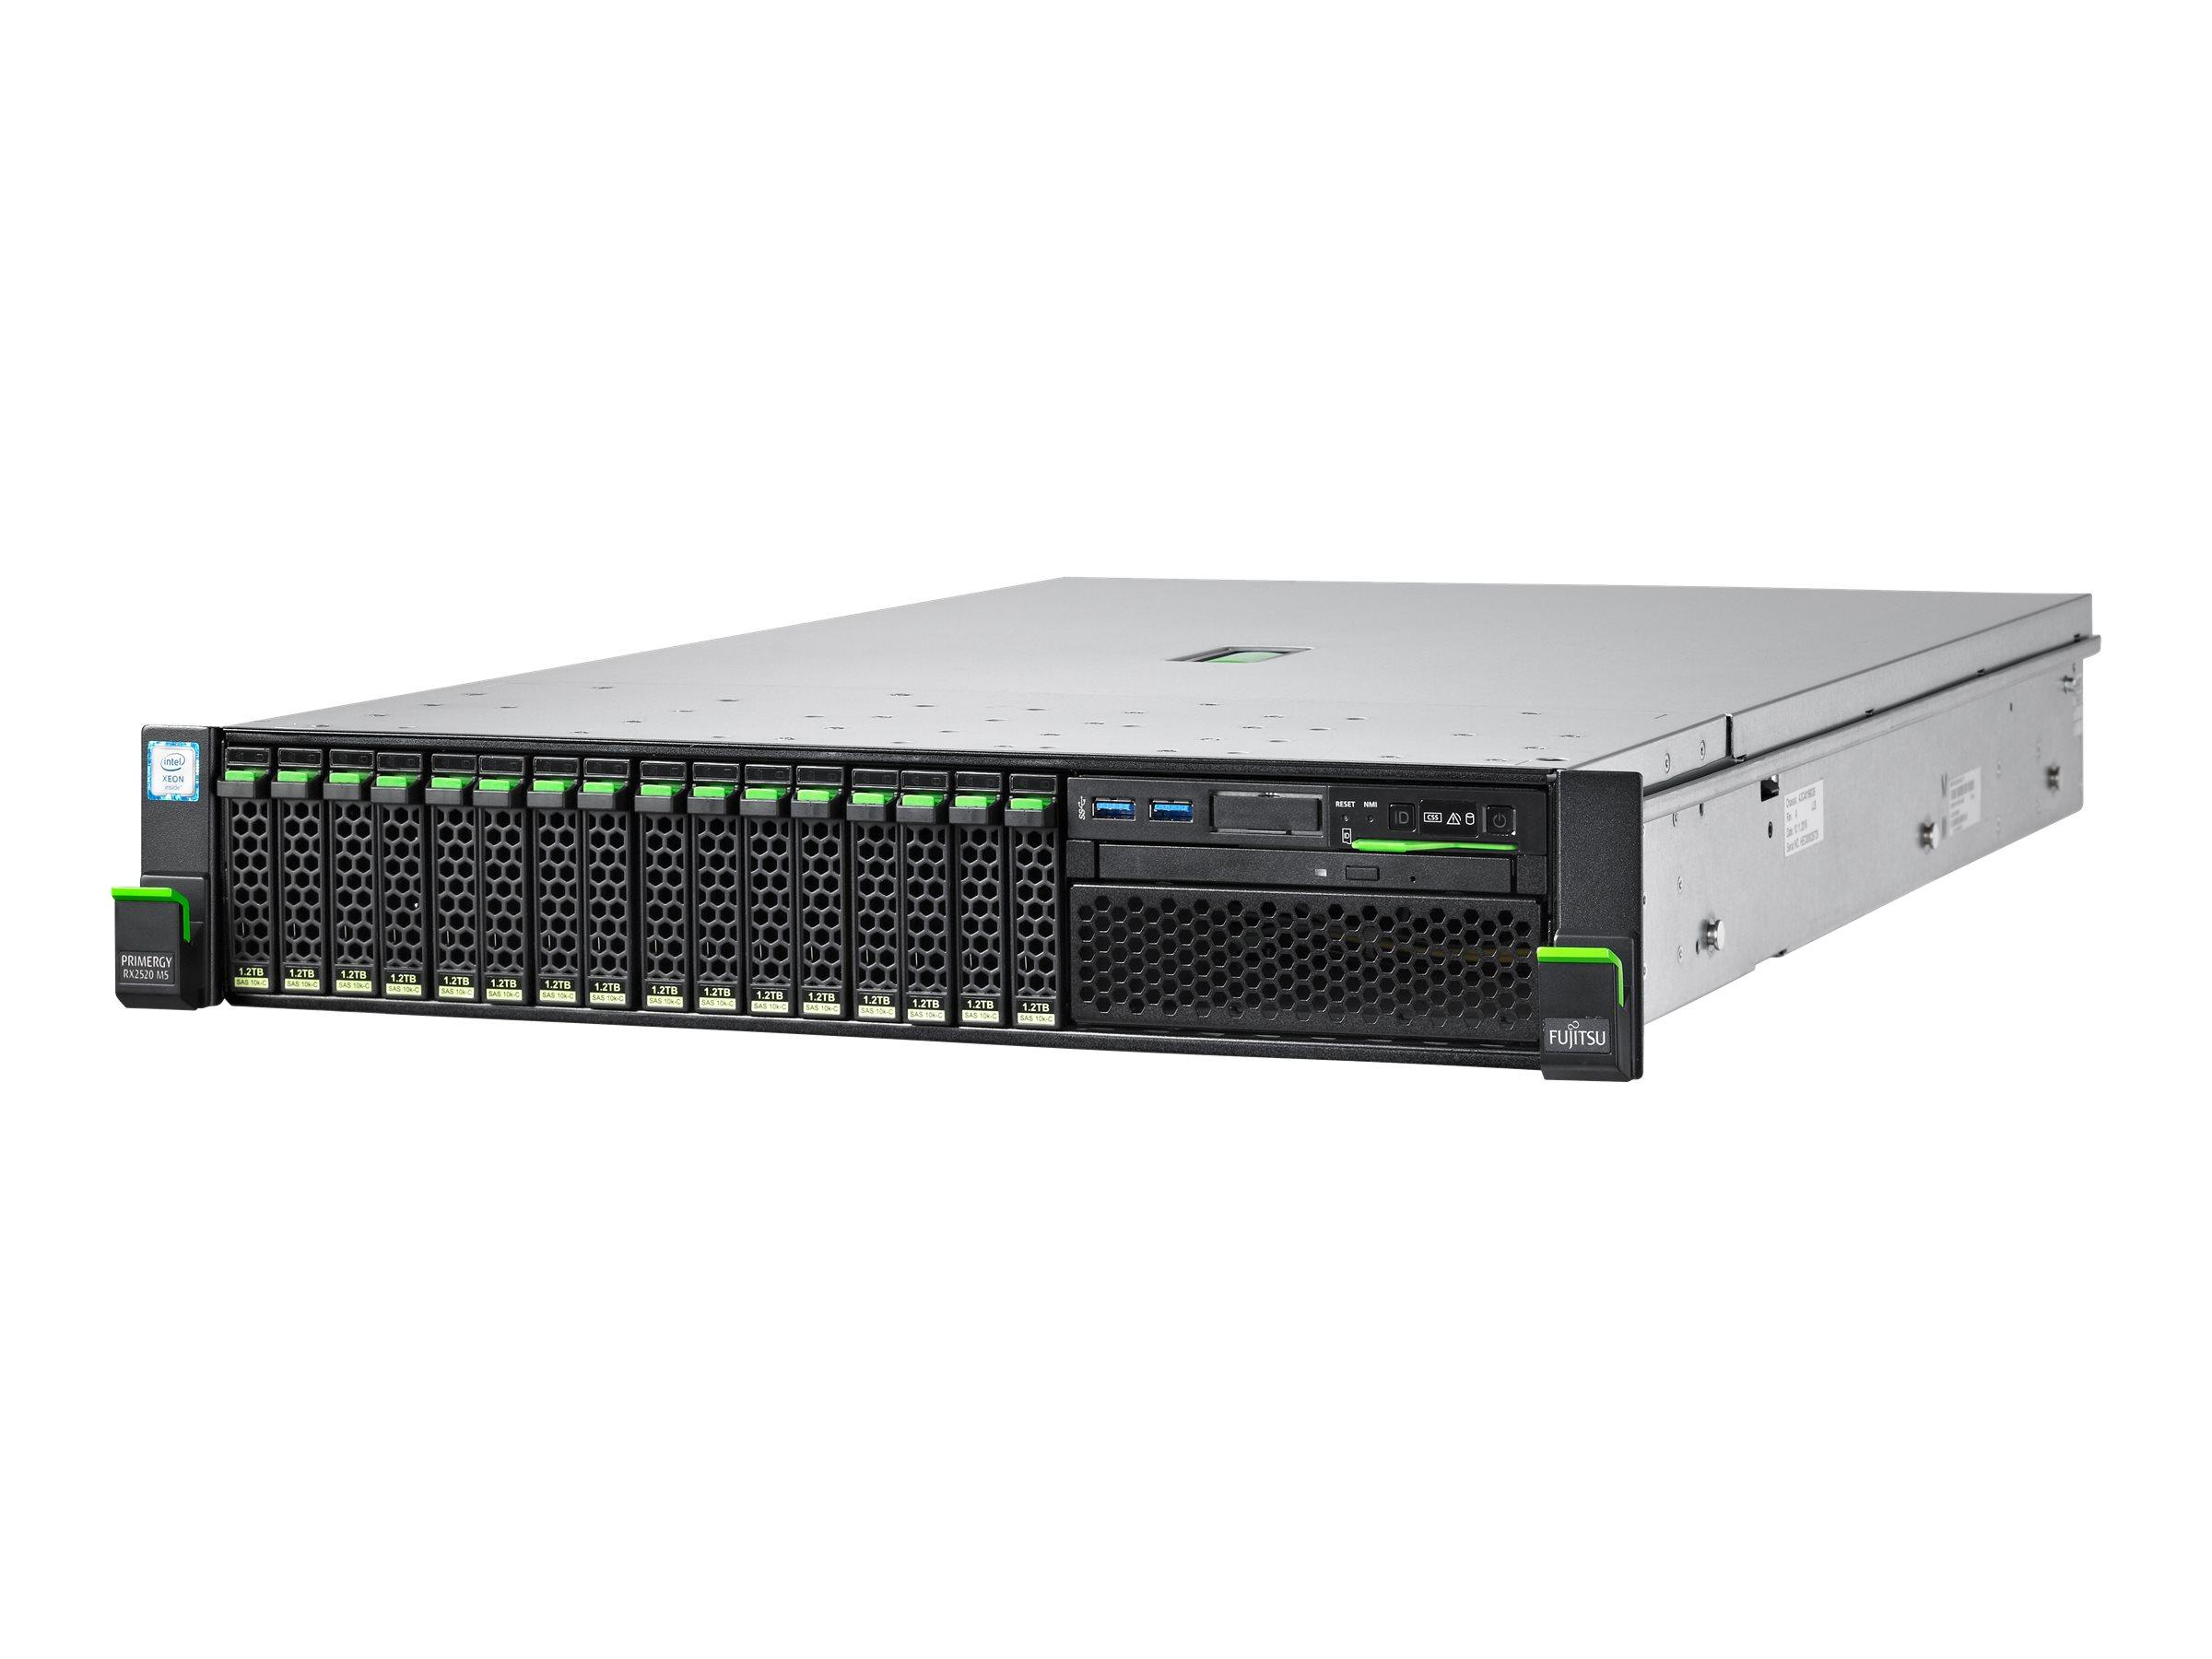 "Fujitsu PRIMERGY RX2520 M5 - Server - Rack-Montage - 2U - zweiweg - 1 x Xeon Silver 4208 / 2.1 GHz - RAM 16 GB - SATA - Hot-Swap 6.4 cm (2.5"")"